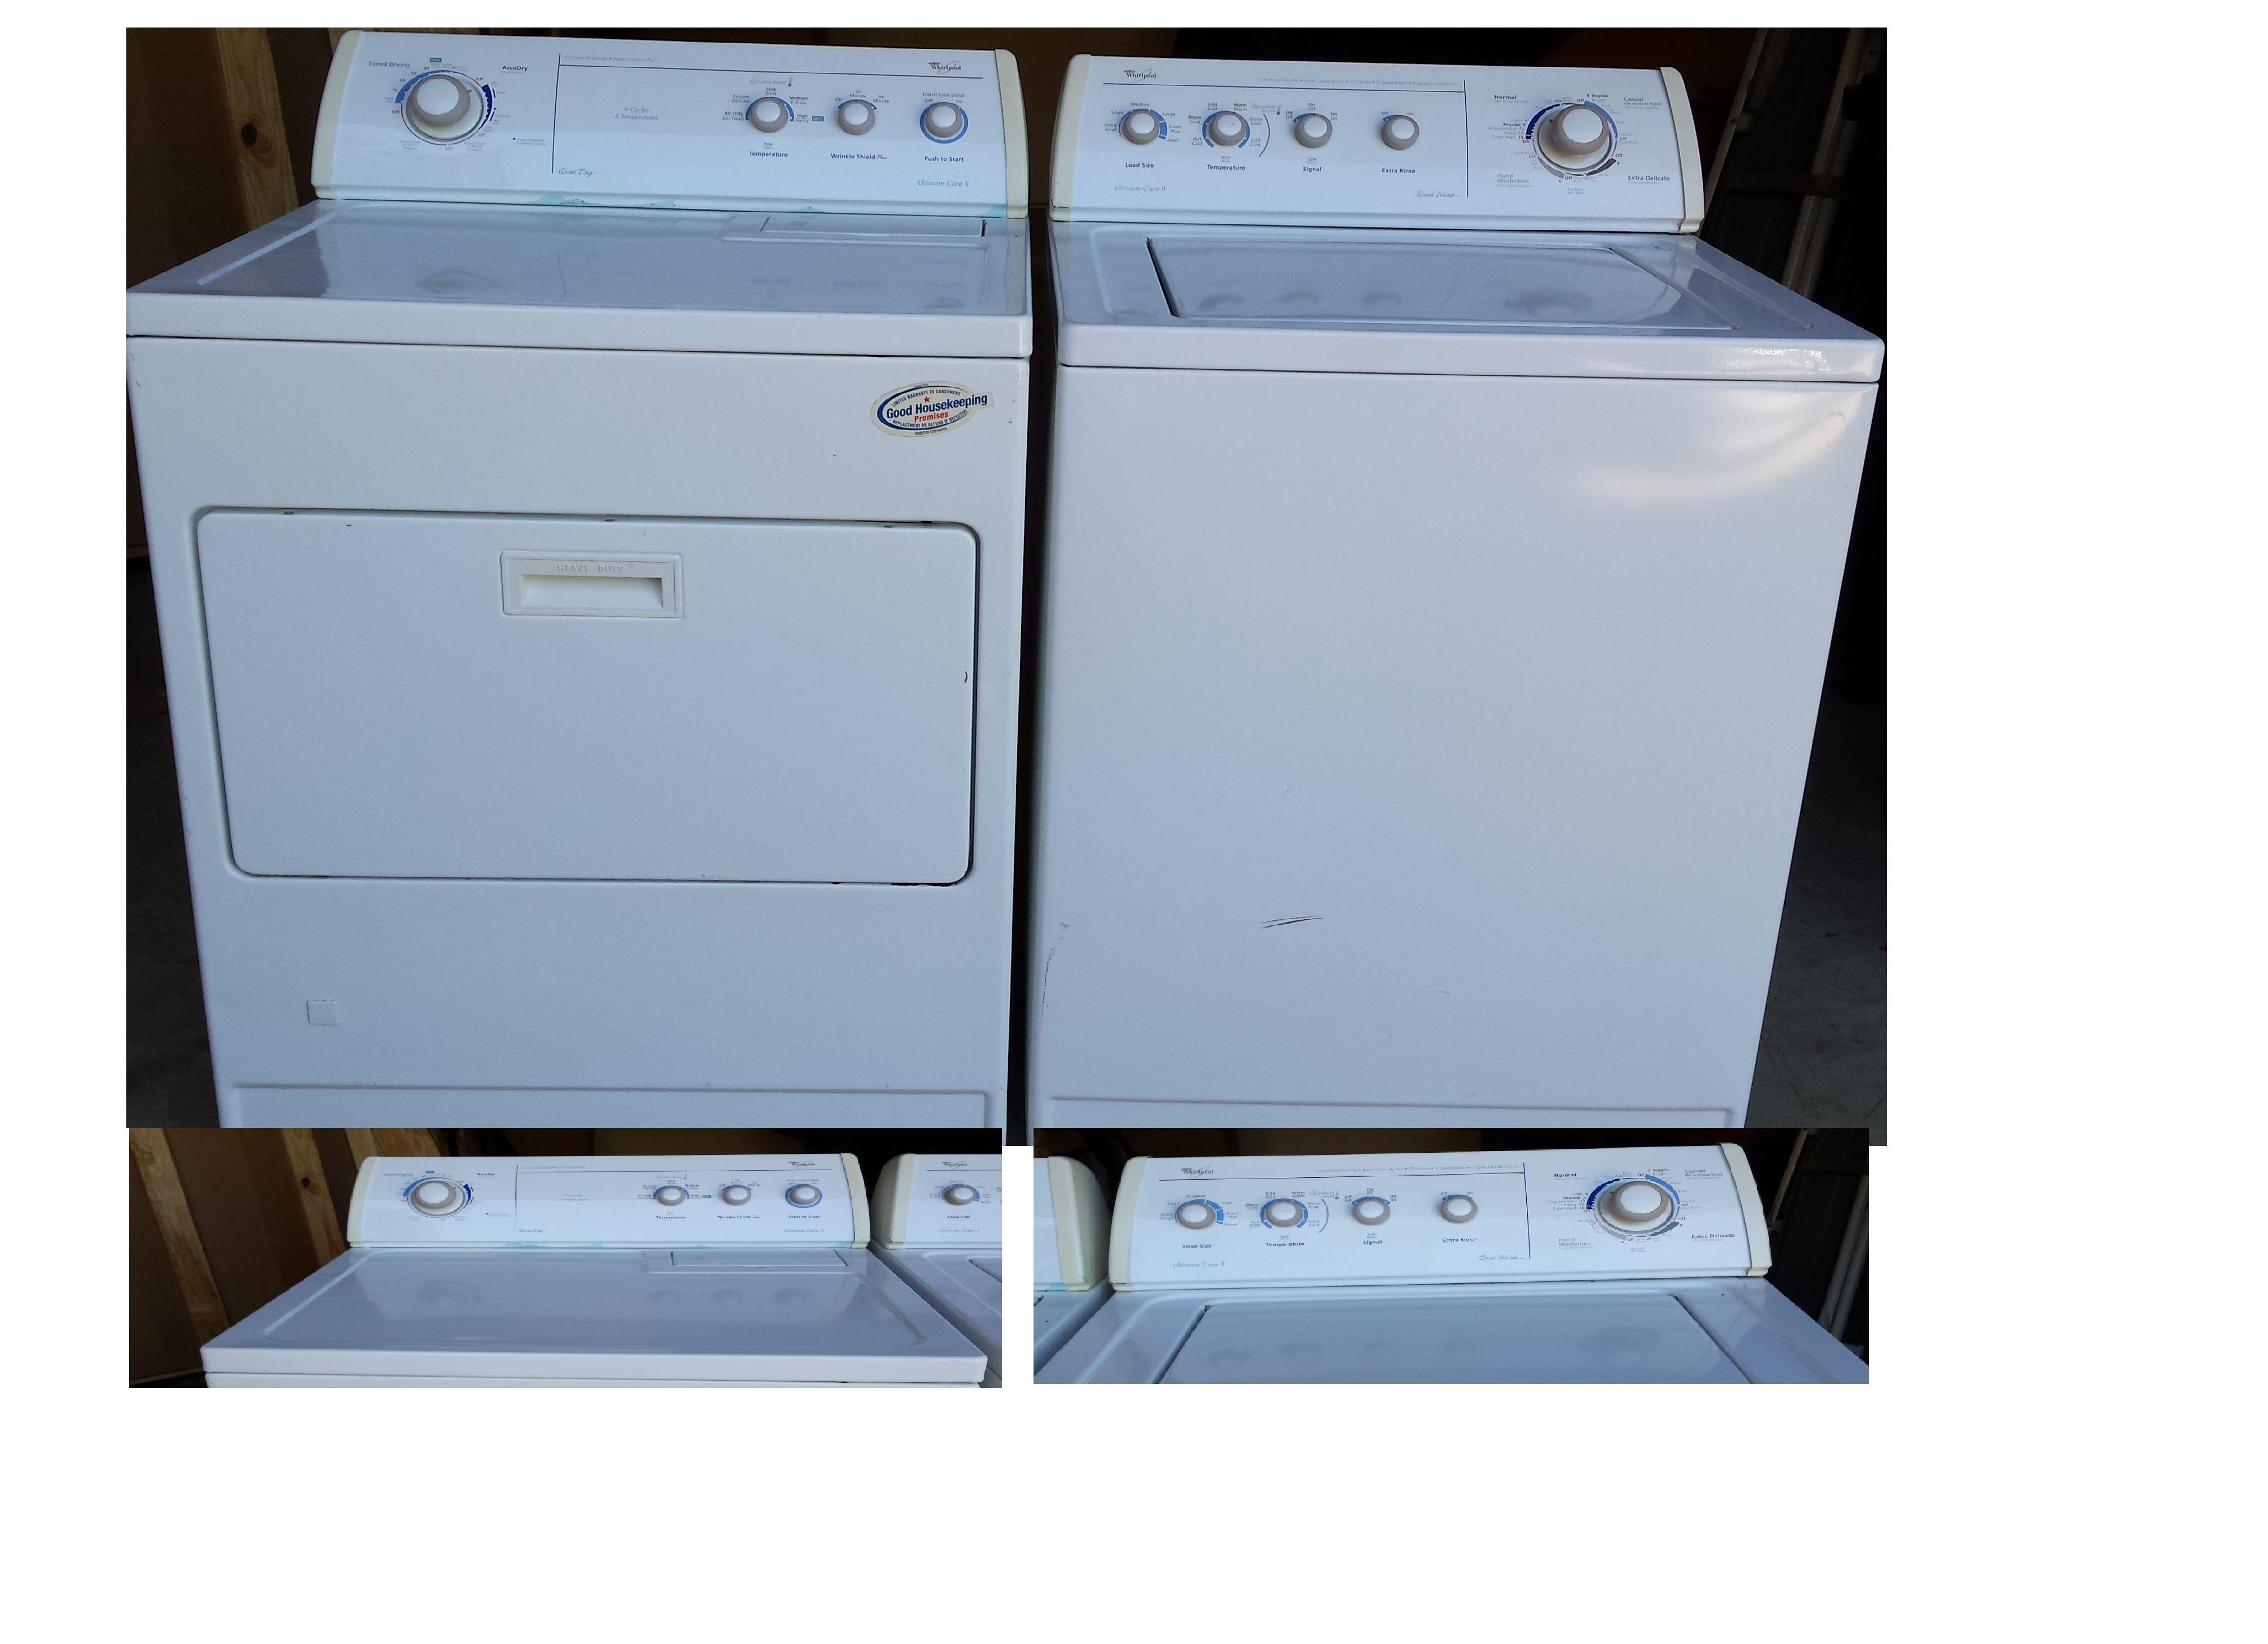 Whirlpool Traditional Washer Gas Dryer In Manueljmary S Garage Sale Denton Tx Garage Refrigerator Maytag Appliances Electric Washer